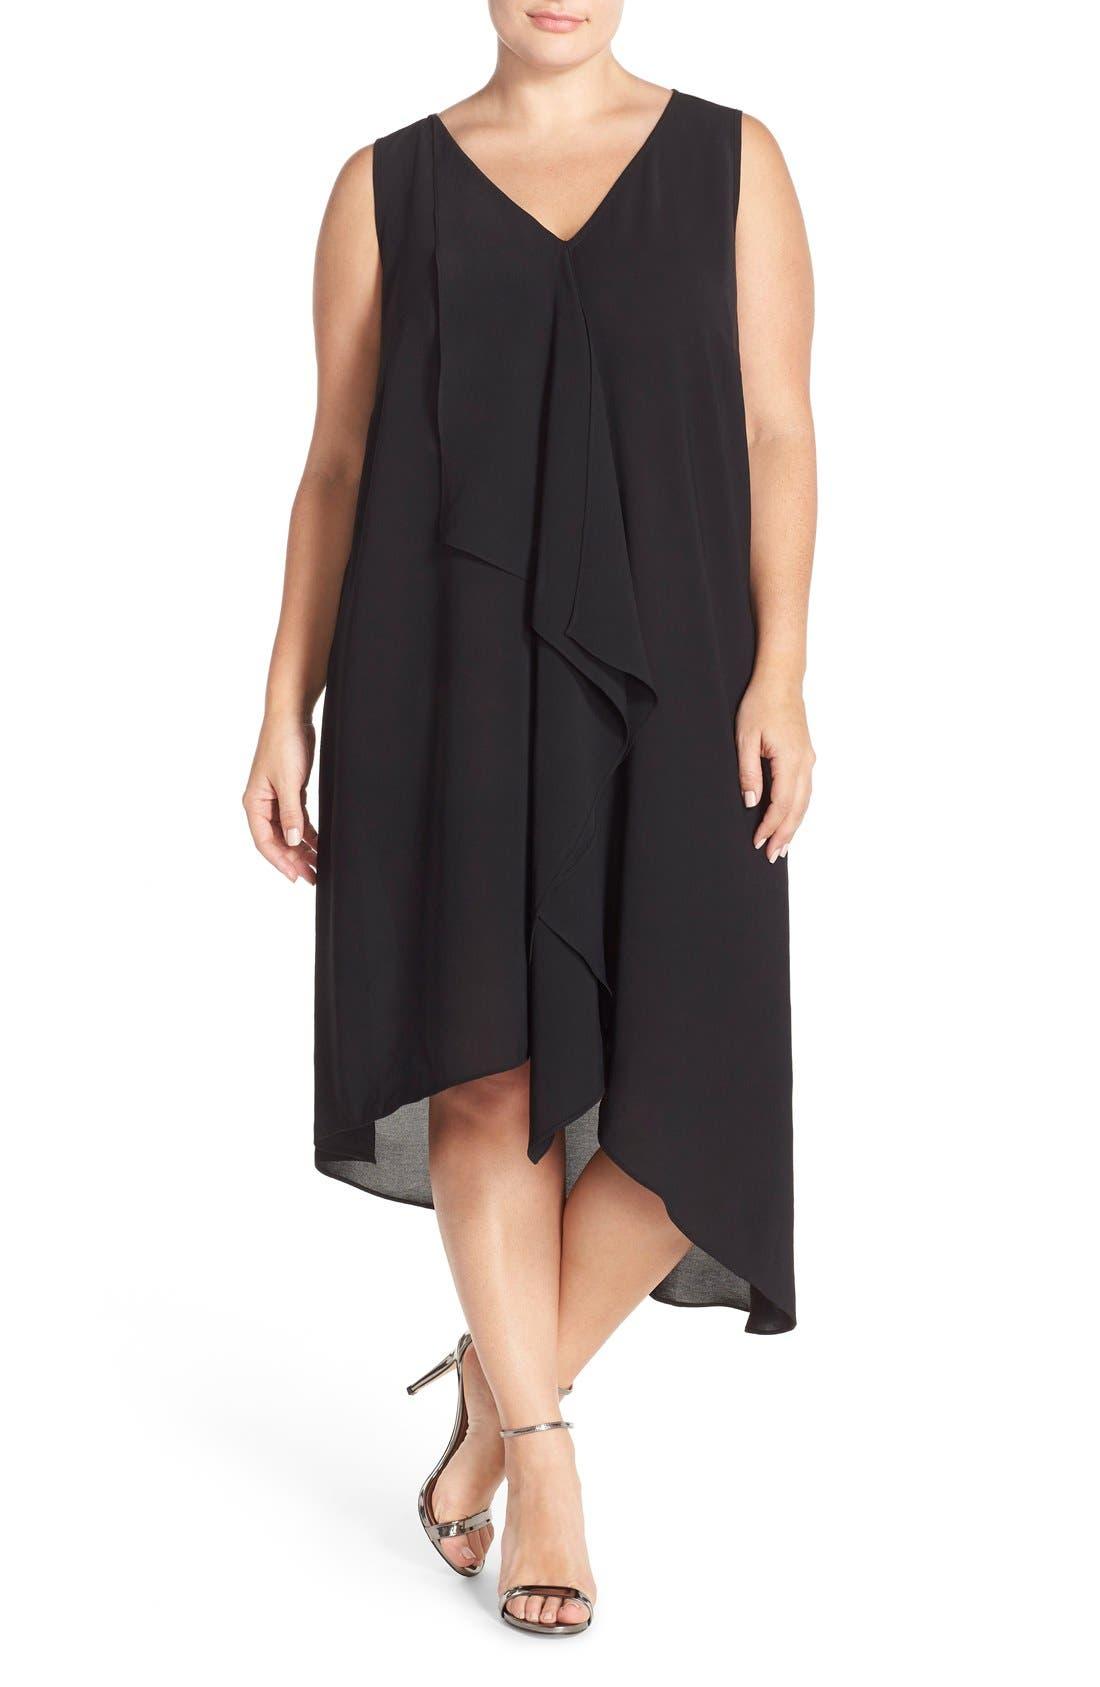 Main Image - Adrianna Papell Sleeveless Asymmetrical Front Drape Crepe Shift Dress (Plus Size)